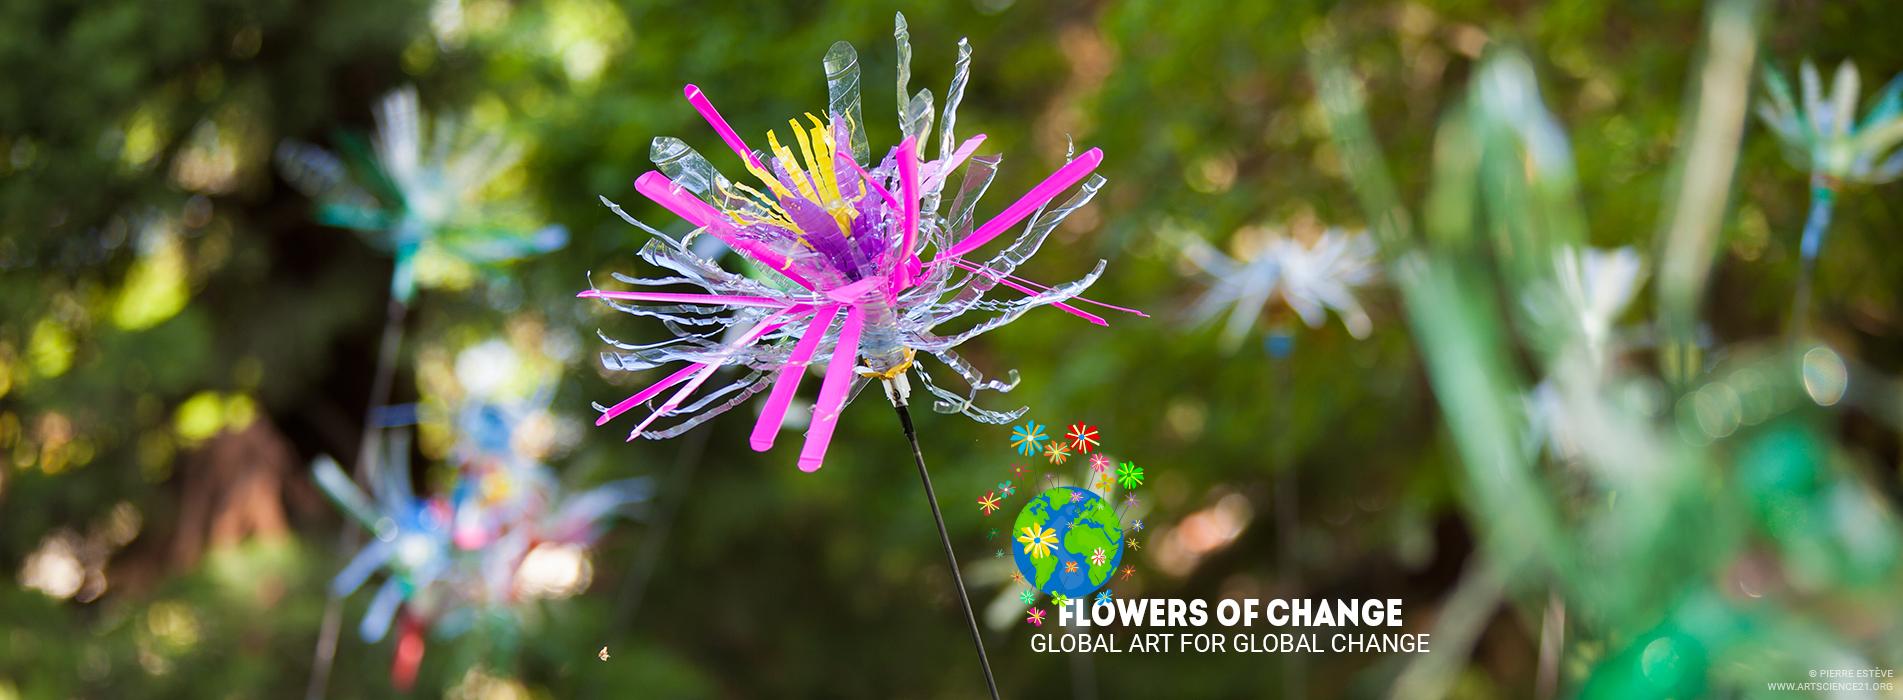 Exposition Flowers of Change de Pierre Estève